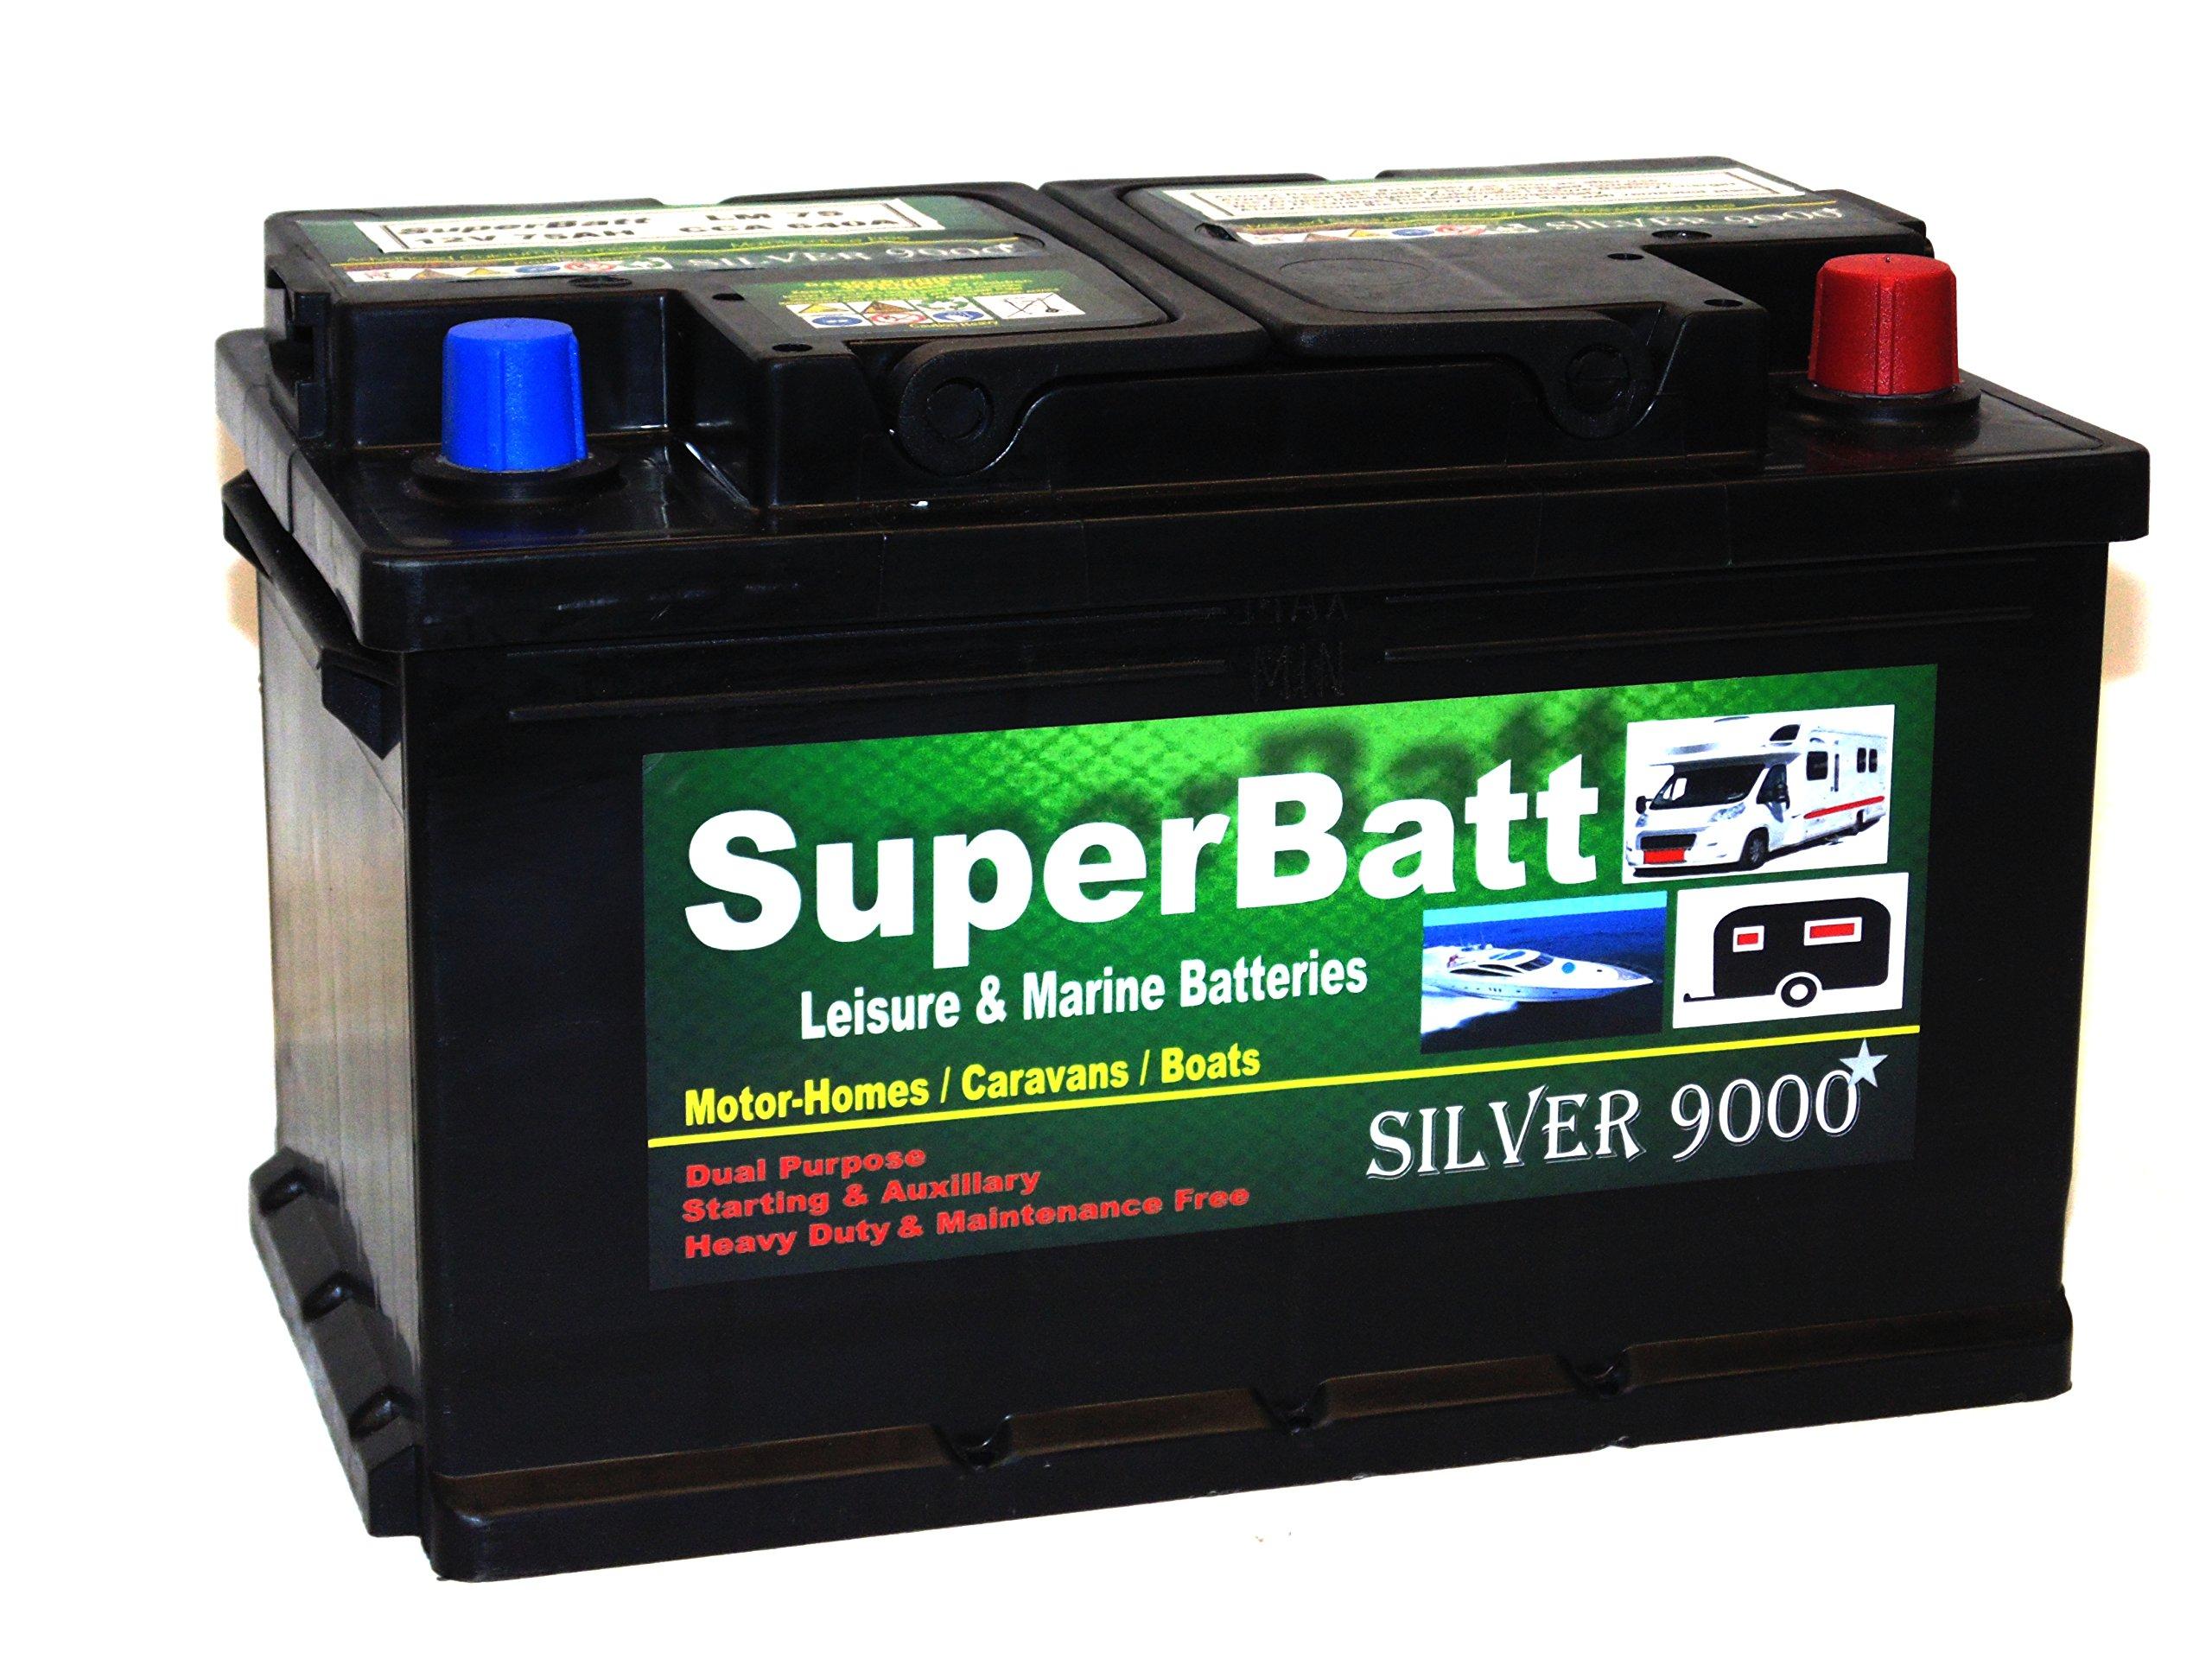 Deep Cycle Leisure Battery 12V 75AH SuperBatt LM75 Battery Caravan Motorhome, Marine Boat